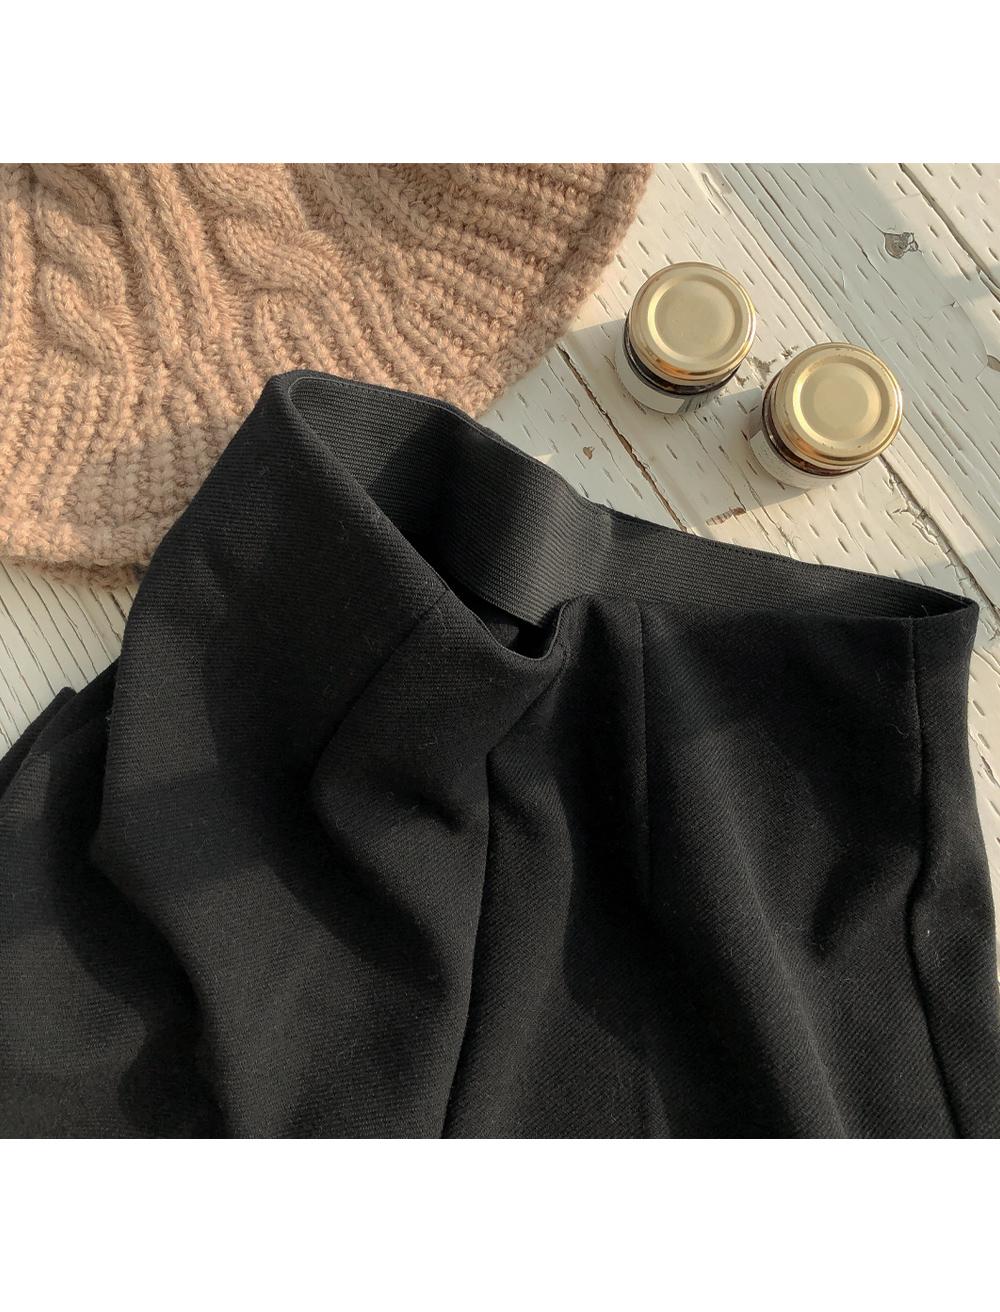 Brushed boot cut band slacks